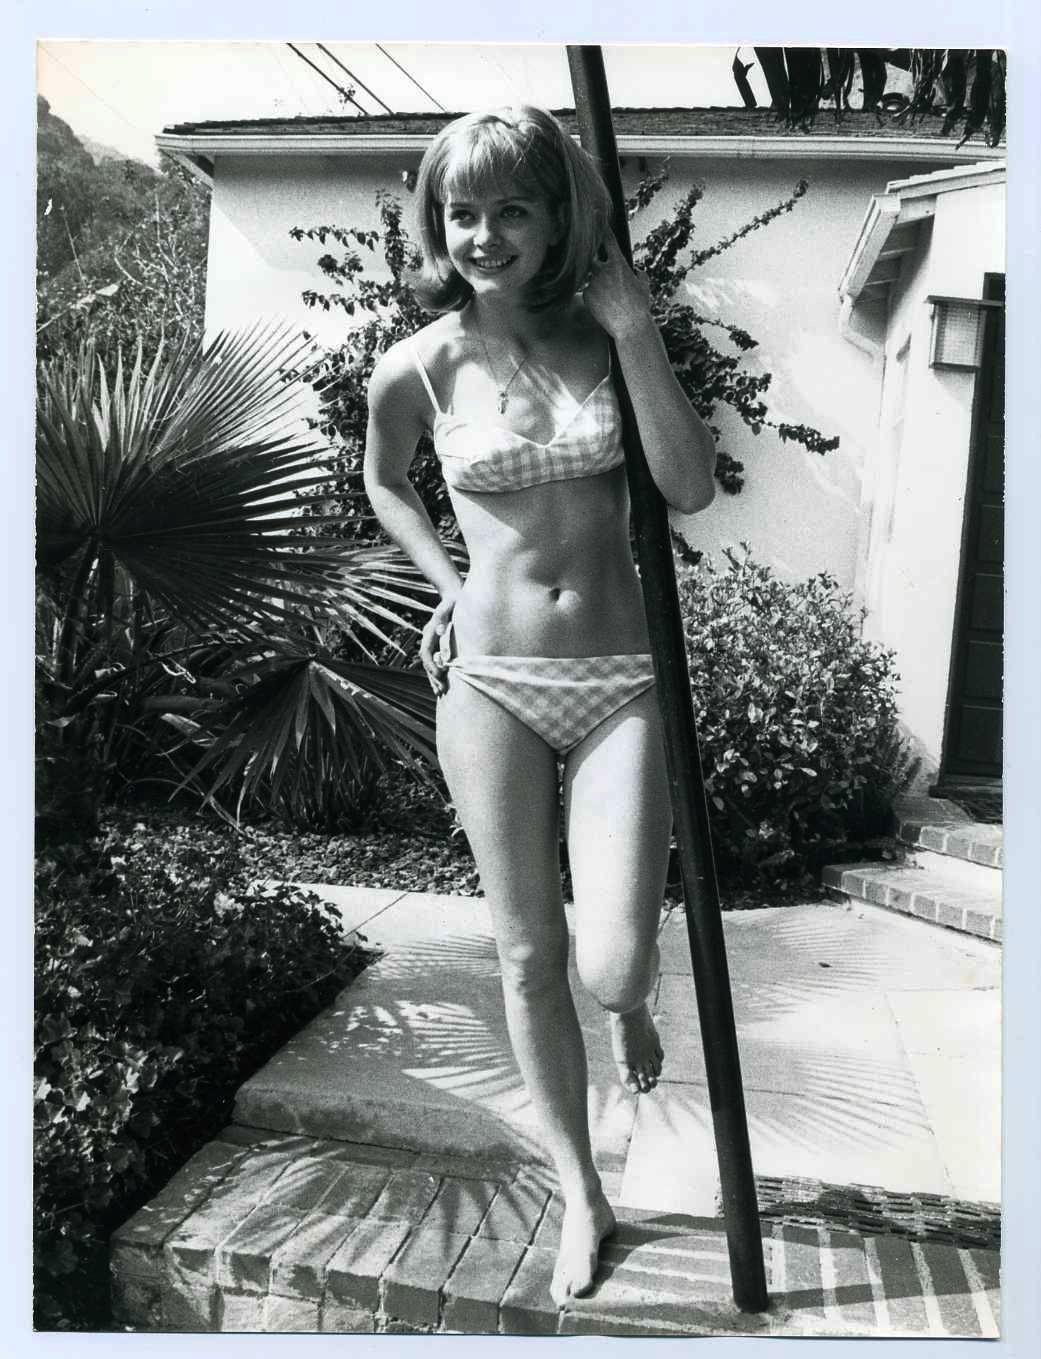 Ewa Aulin Candy 1968 Candy 1968 Celebrity Breasts